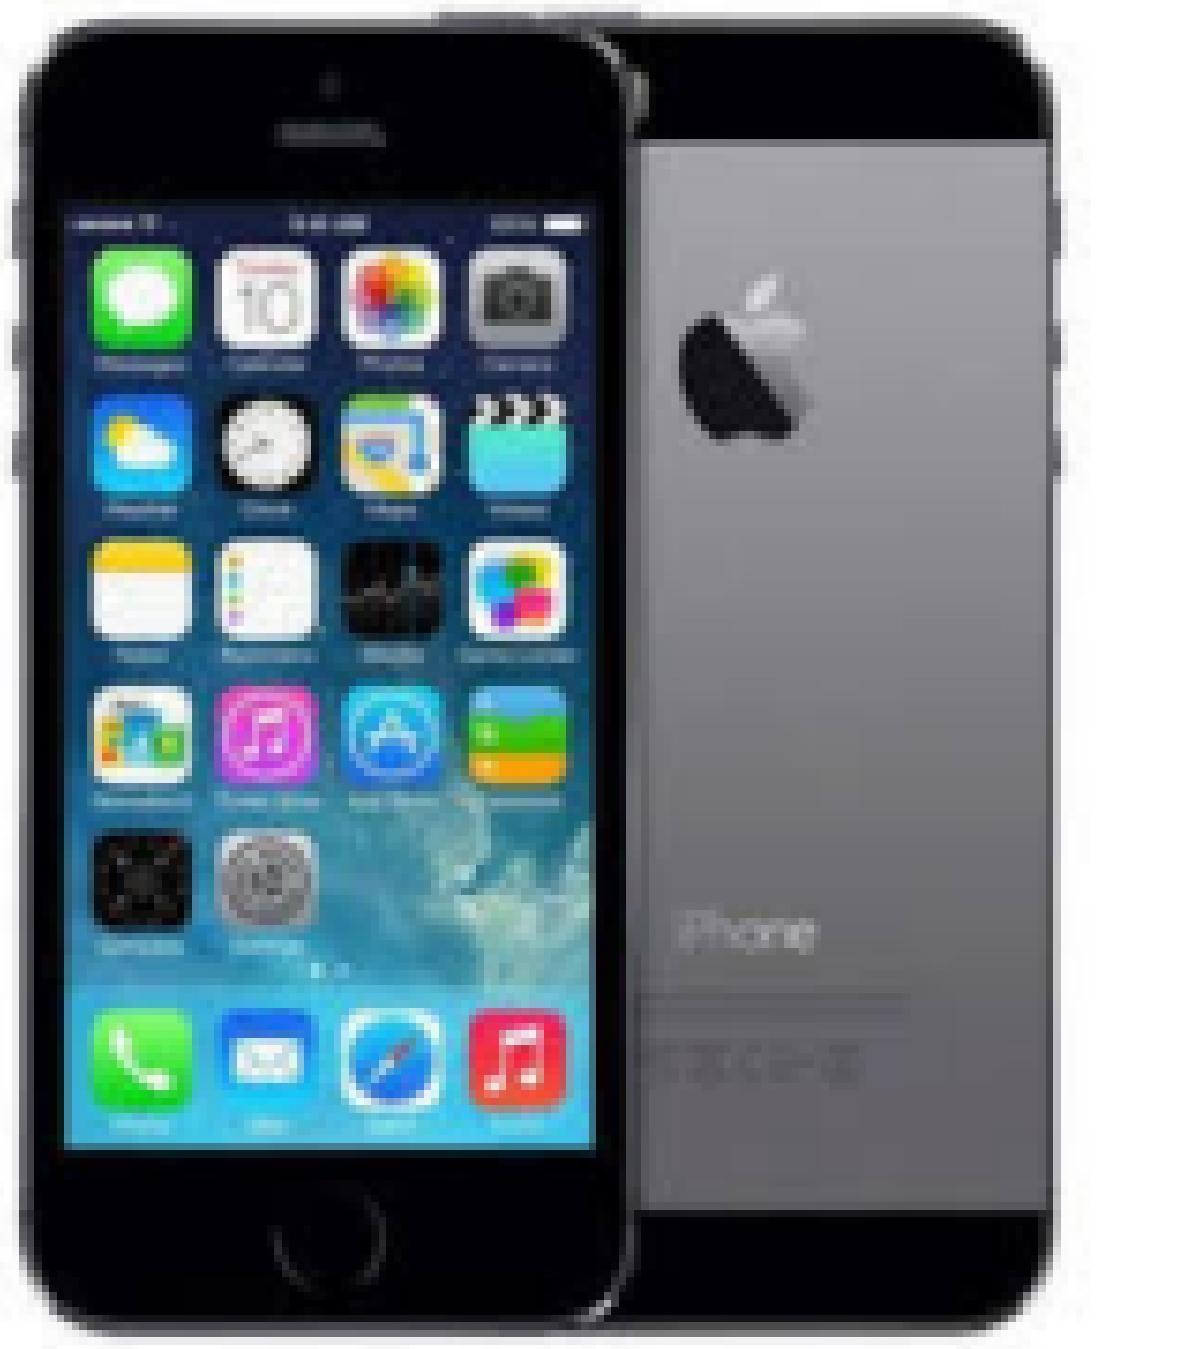 Apple-iPhone-5s-Unlocked-GSM-Unlocked-AT-amp-T-Verizon-T-Mobile-A1533 thumbnail 15